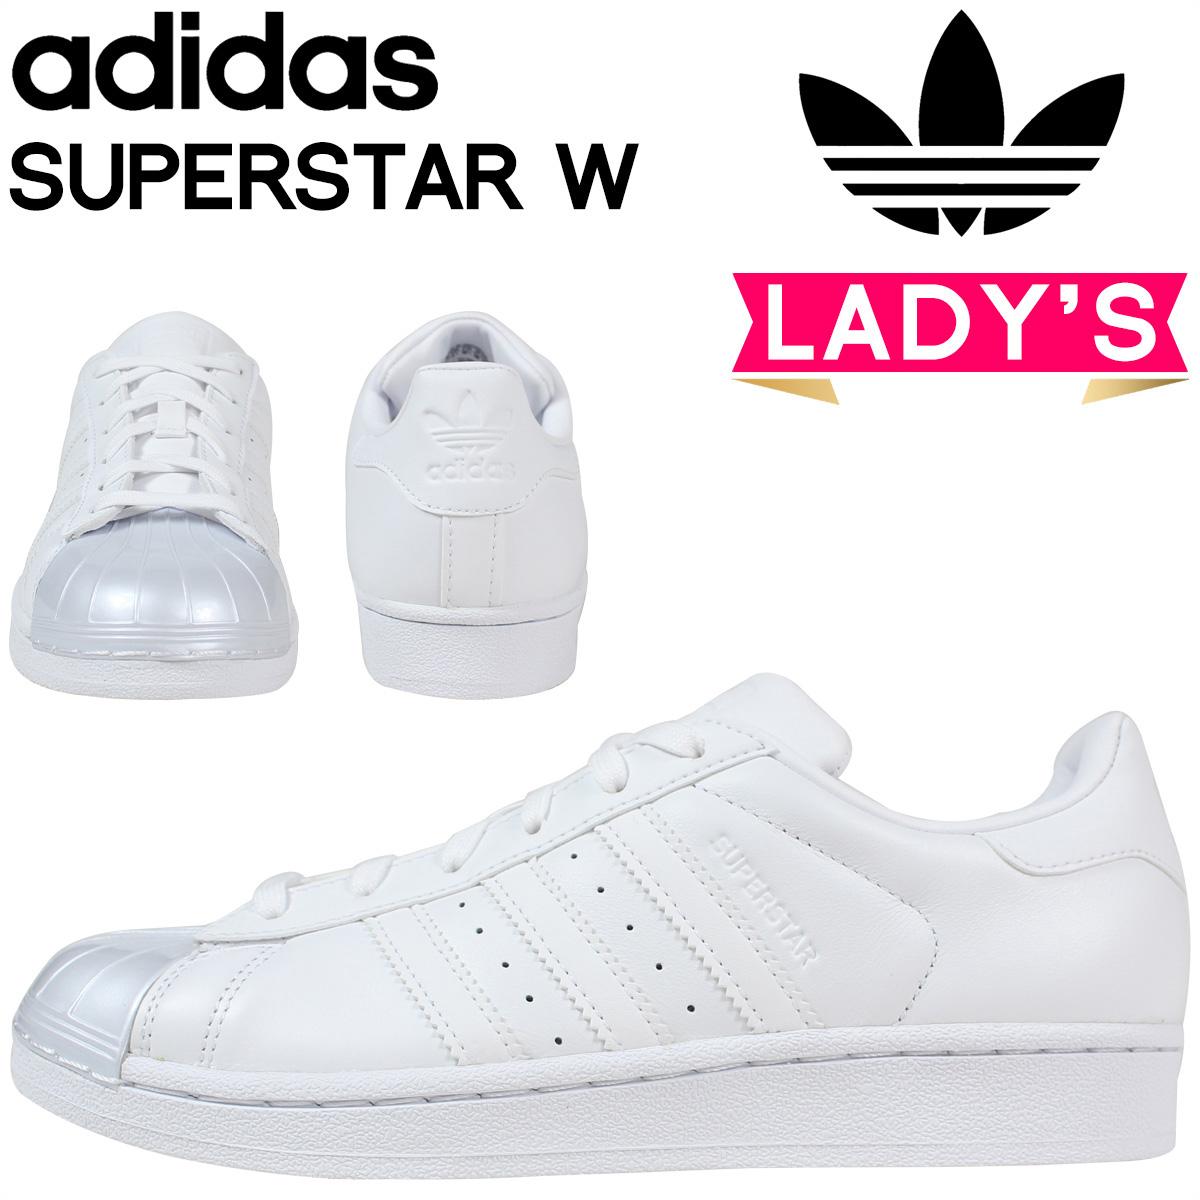 Superstar Glossy Toe adidas Originals guDLje2f